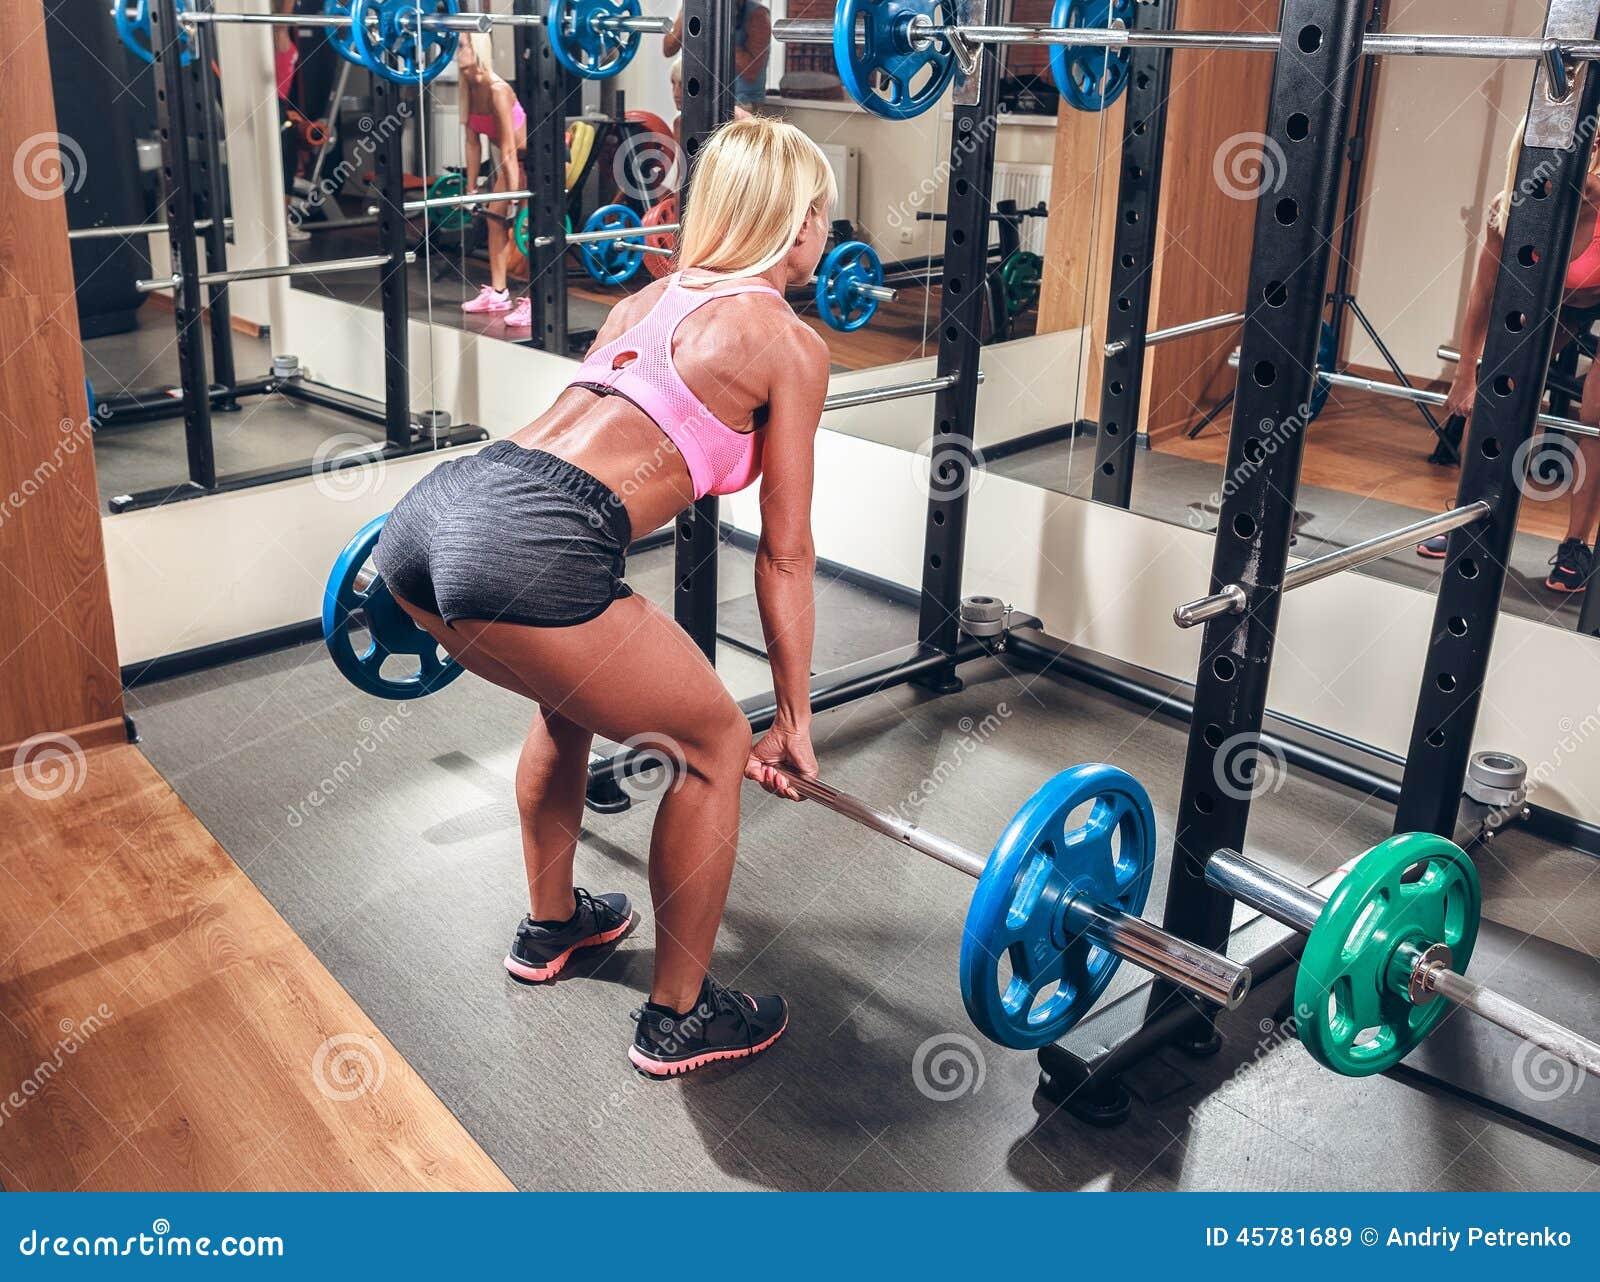 sexy girls doing squats